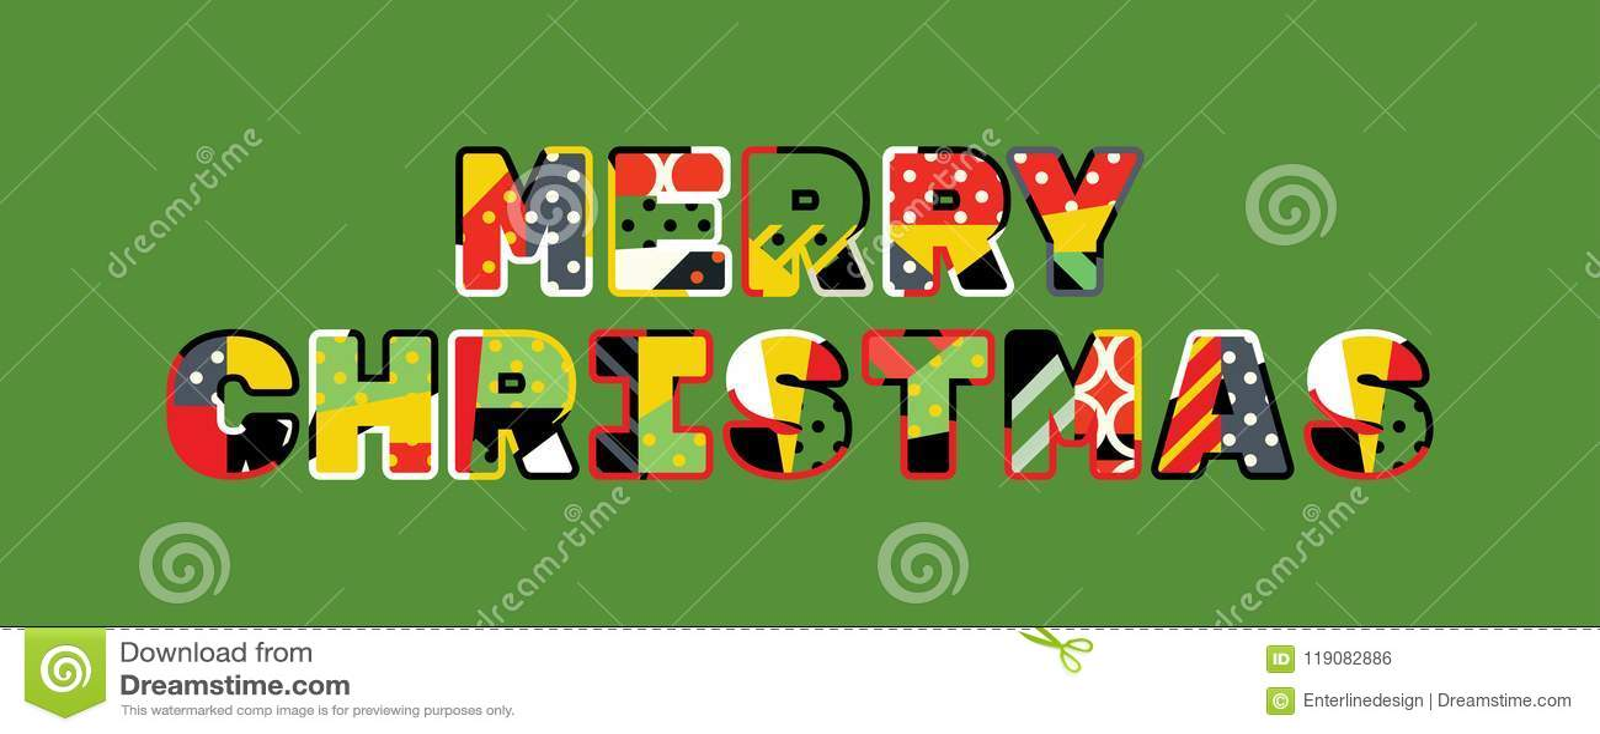 Merry Christmas Concept Word Art Illustration Stock Vector